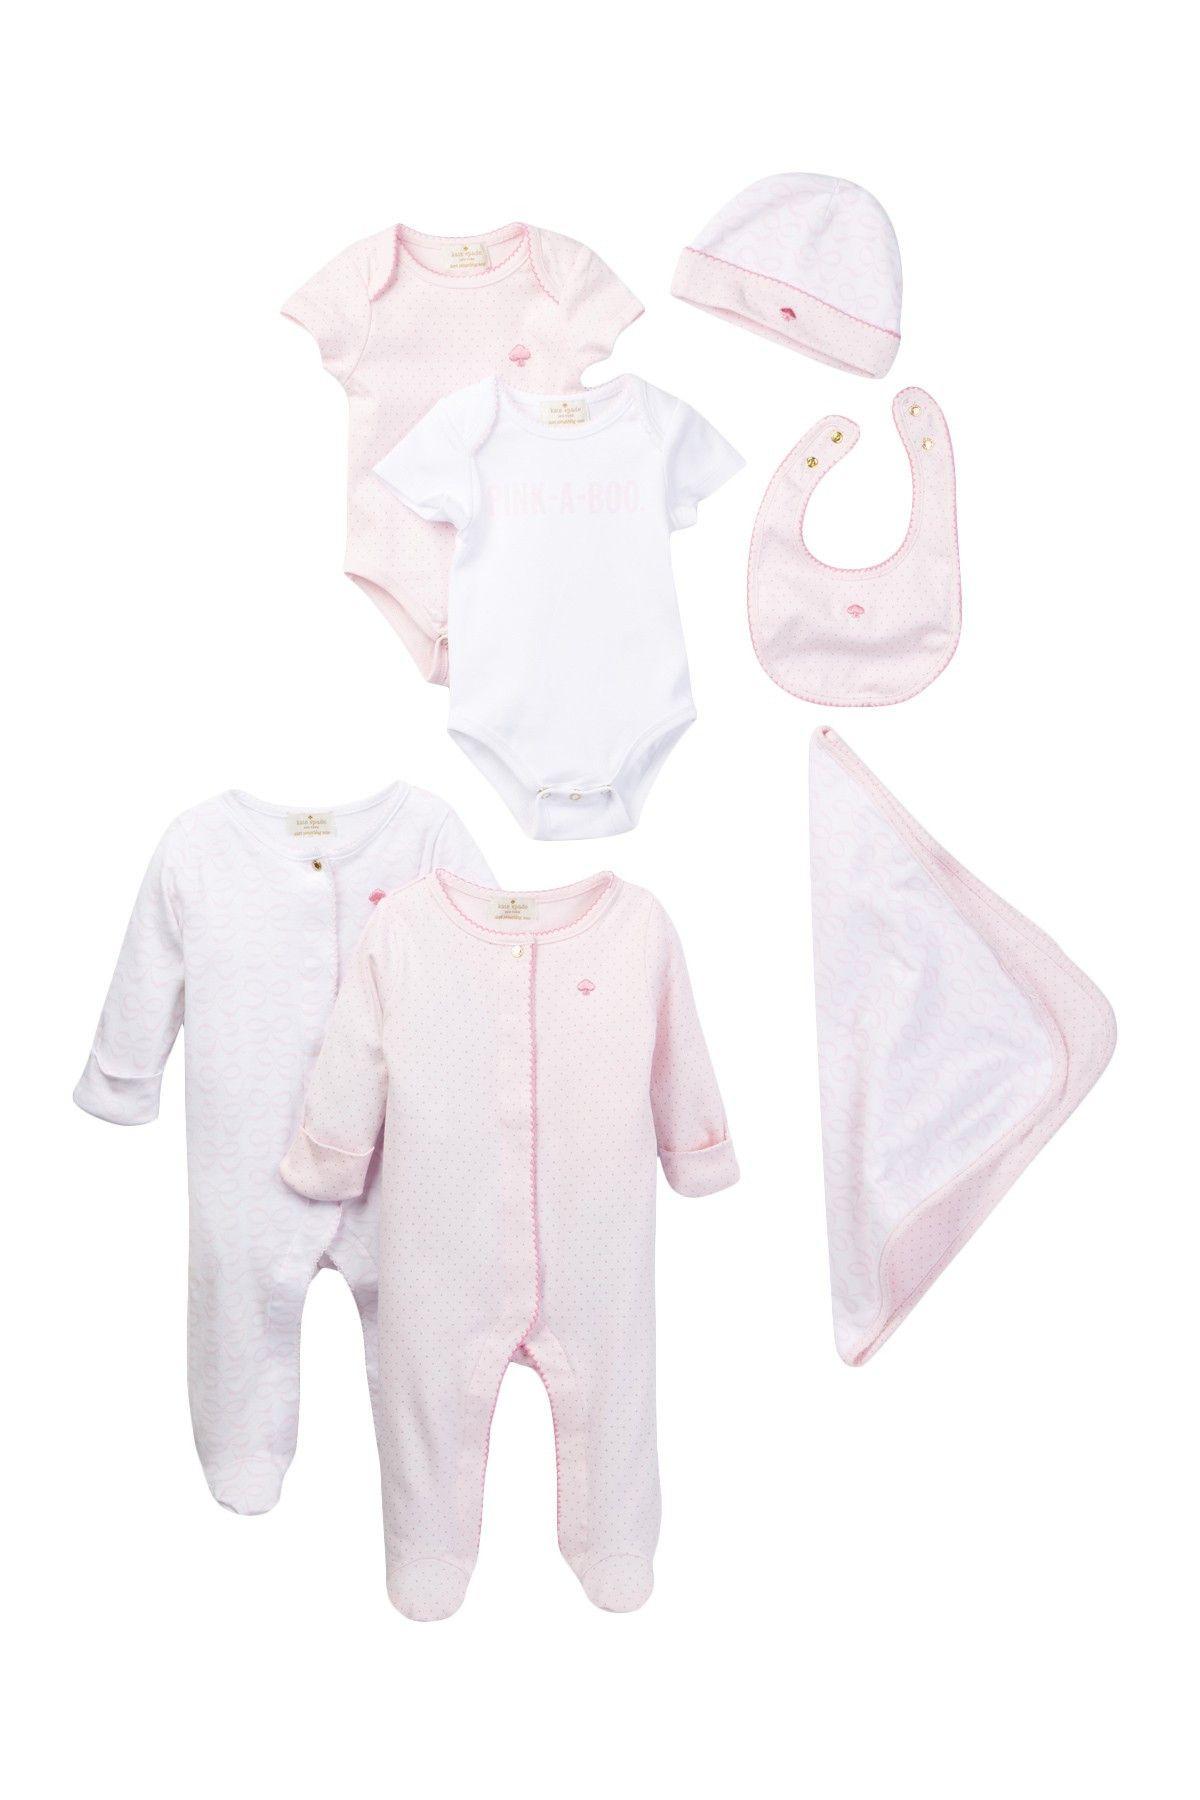 Seven Piece Gift Box Set Baby Girls